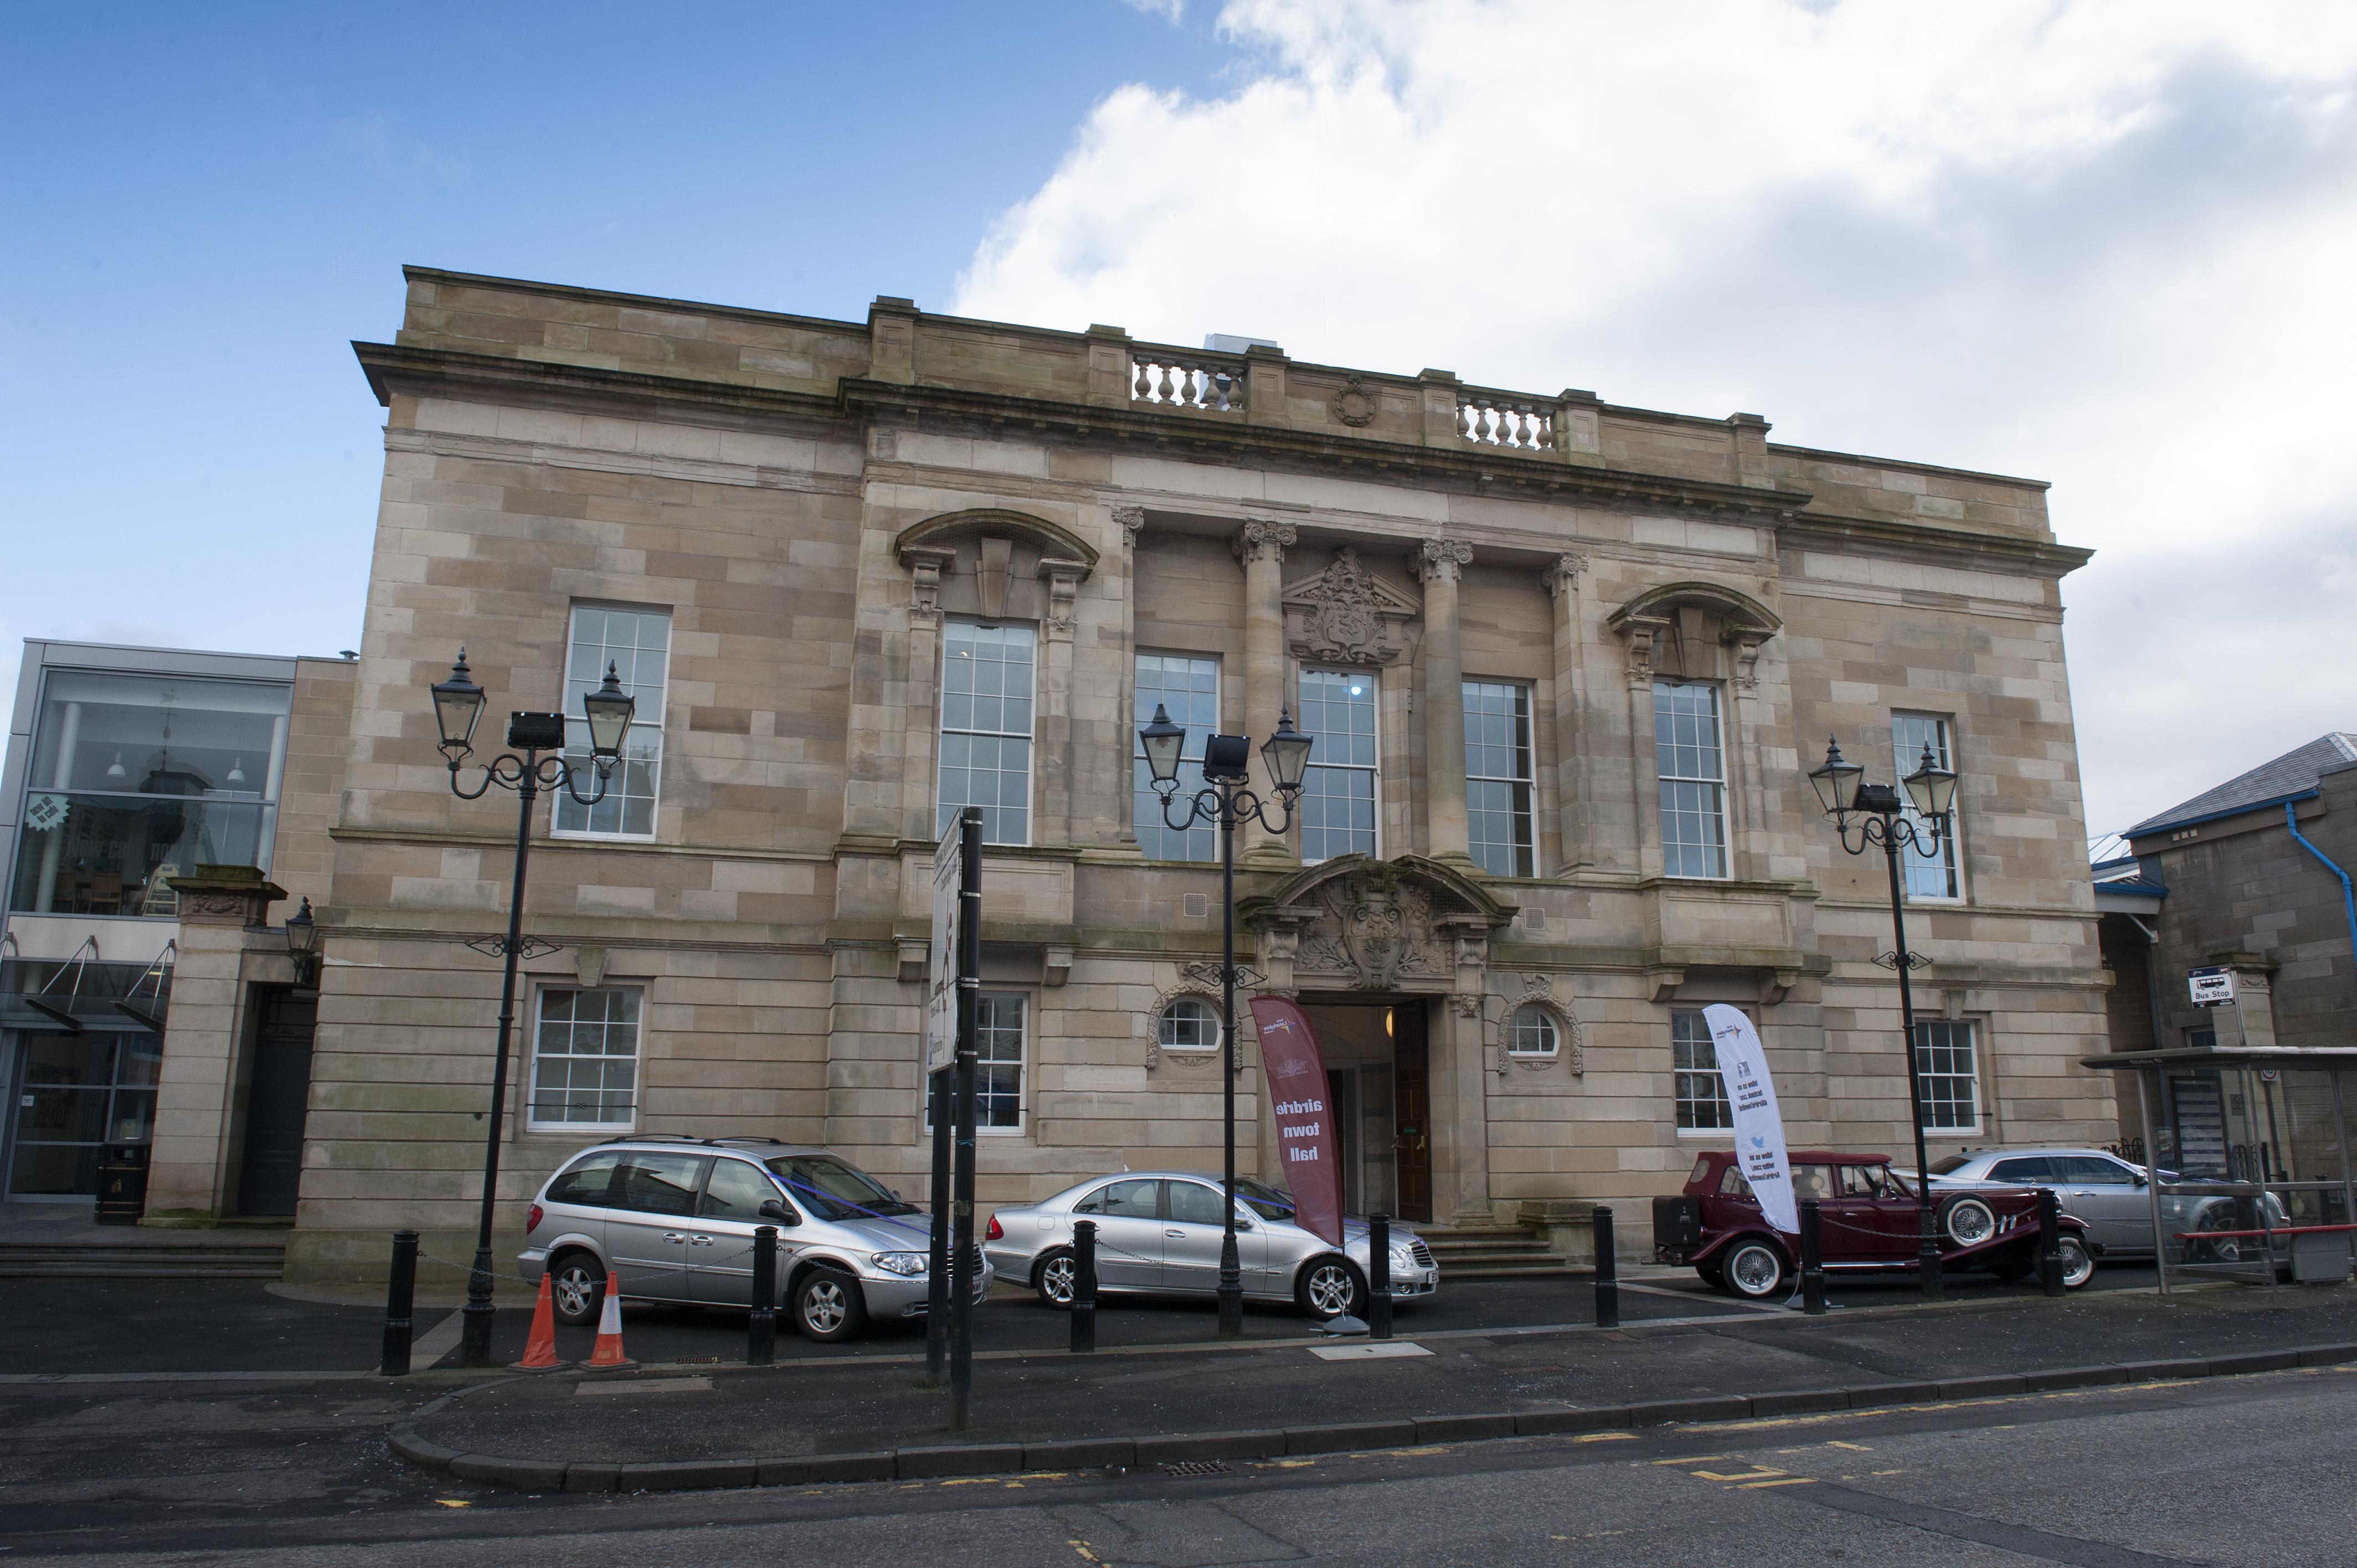 Aidrie Town Hall